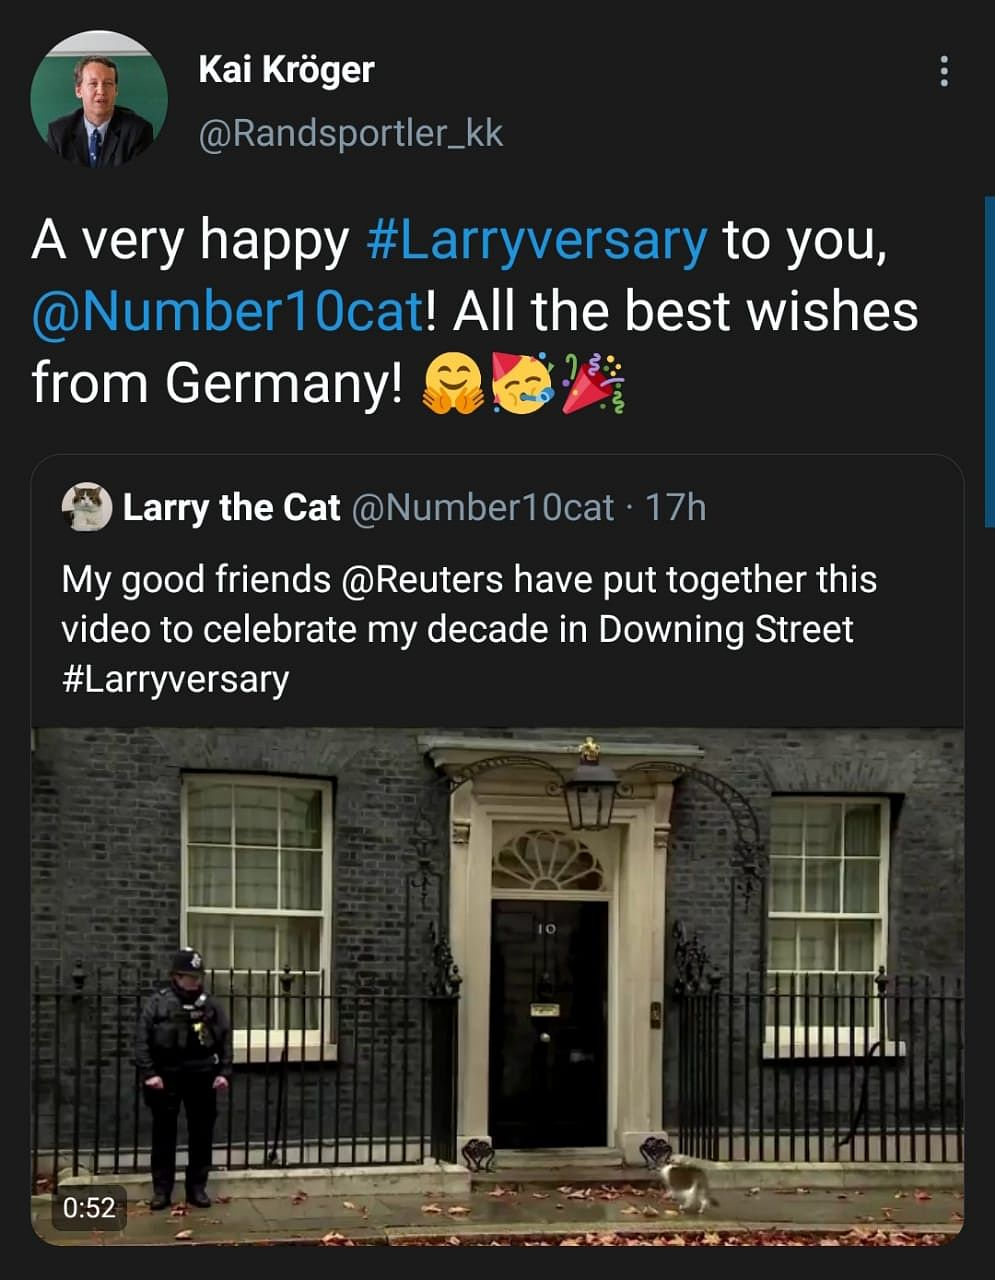 Cute Alert: Twitter Celebrates #Larriversary for Tomcat Larry